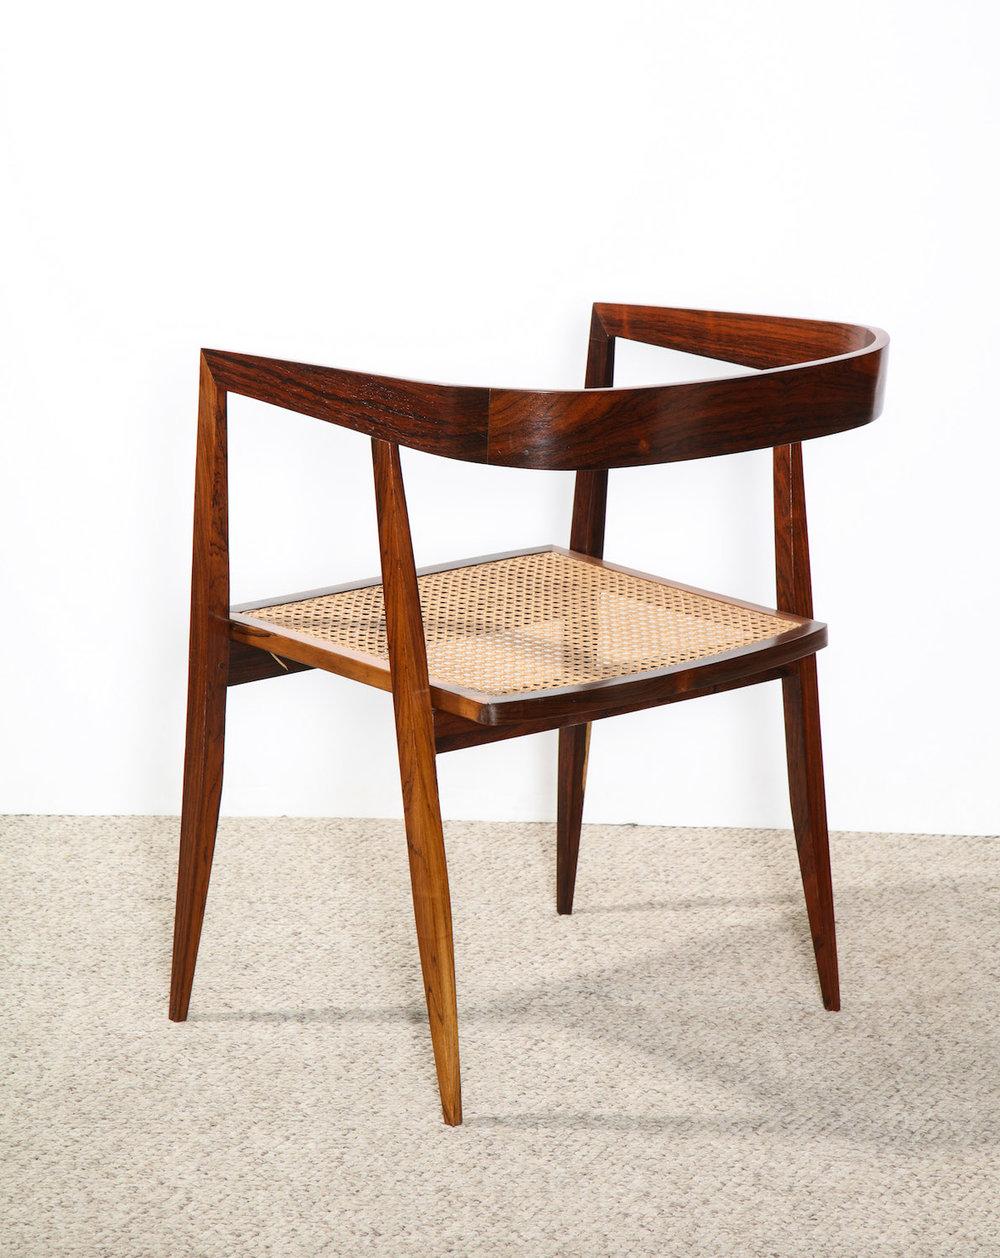 Tenriero Dining Chair 7.jpg